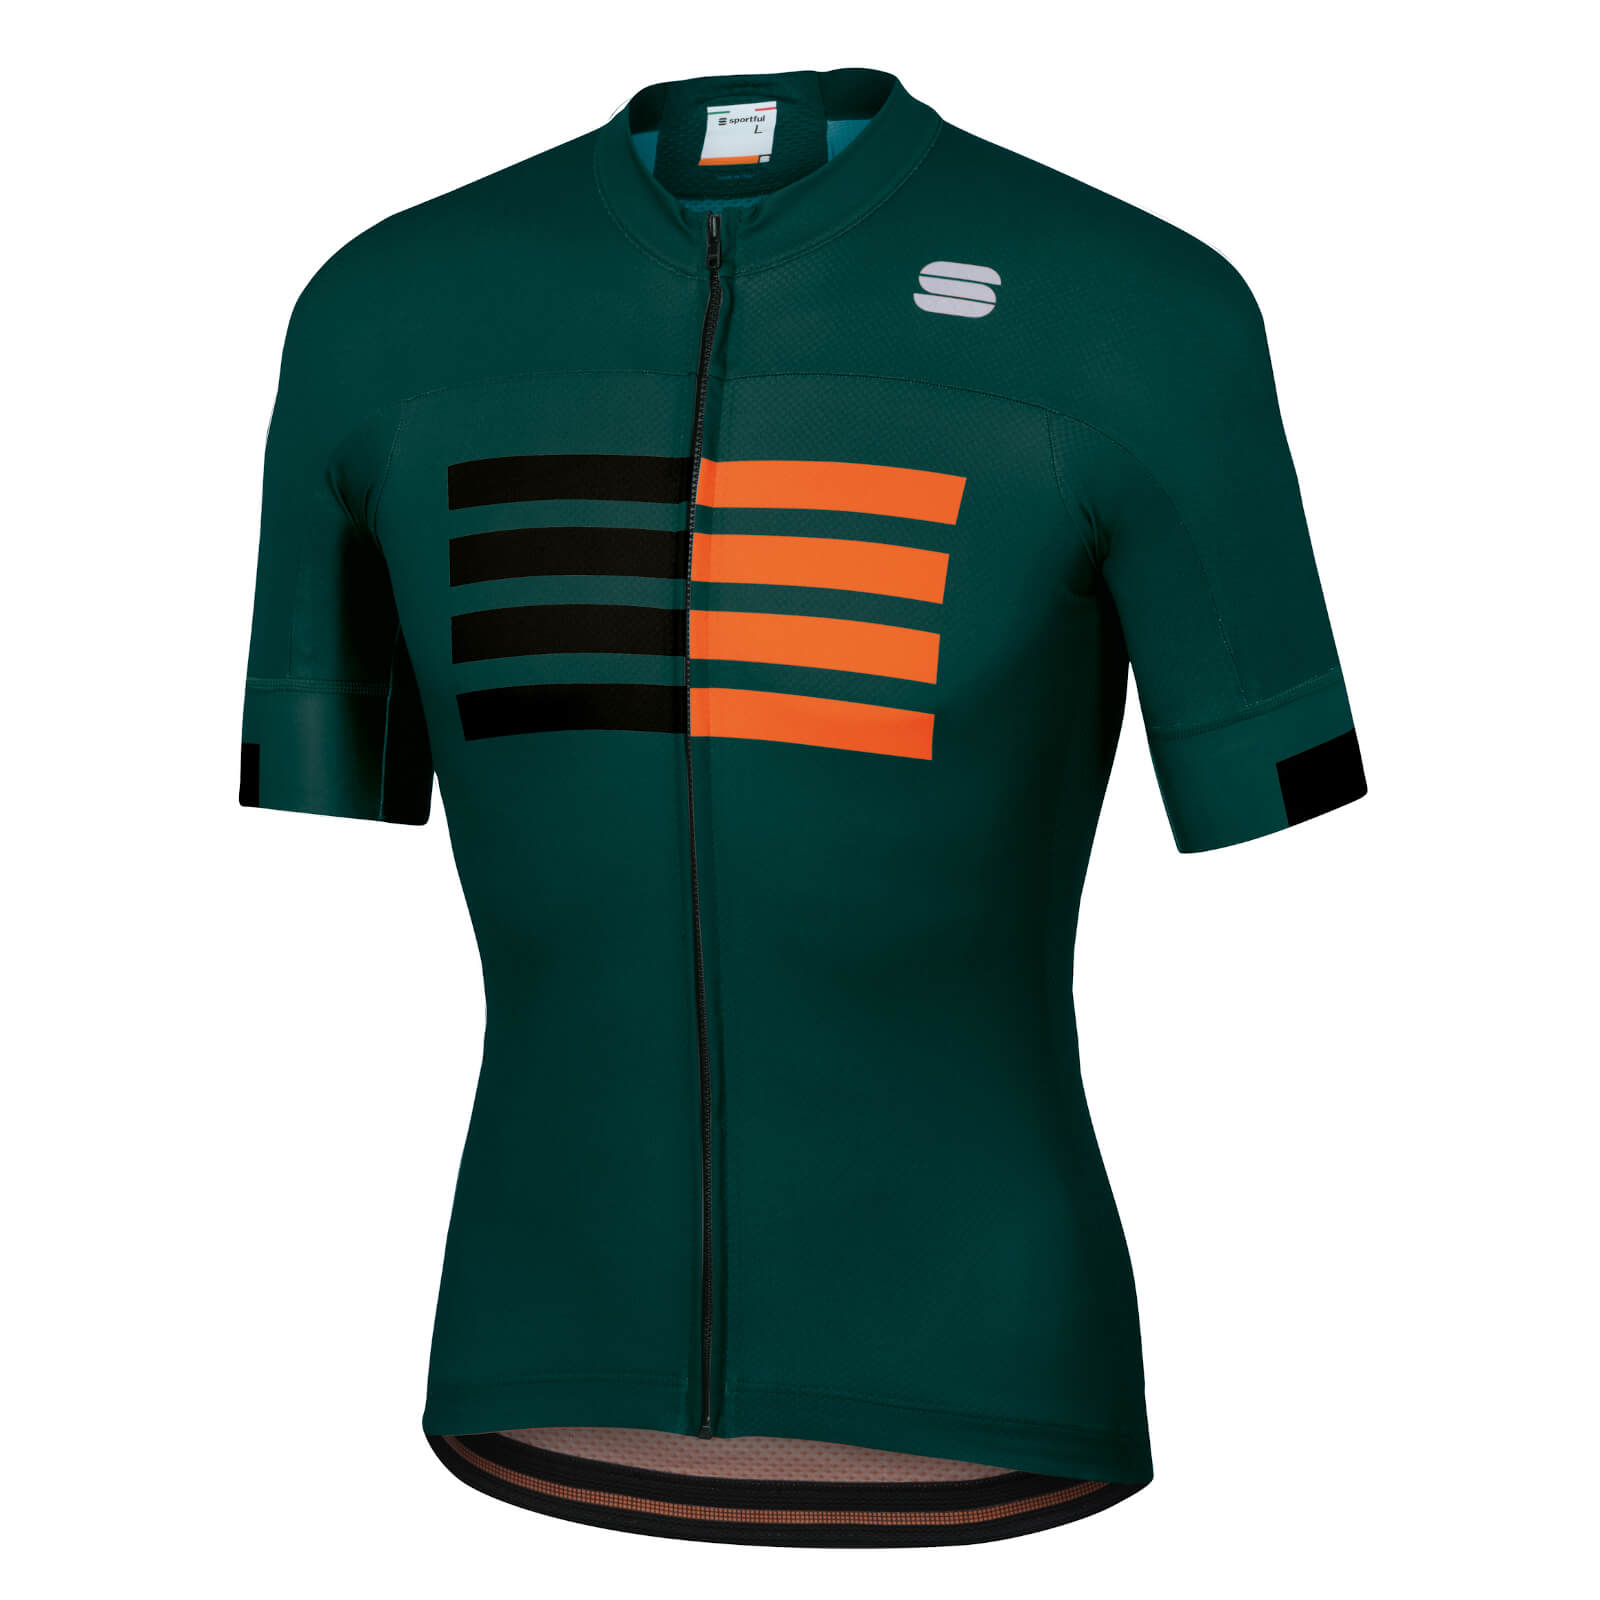 Sportful Wire Jersey - XL - Sea Moss/Black/Orange SDR